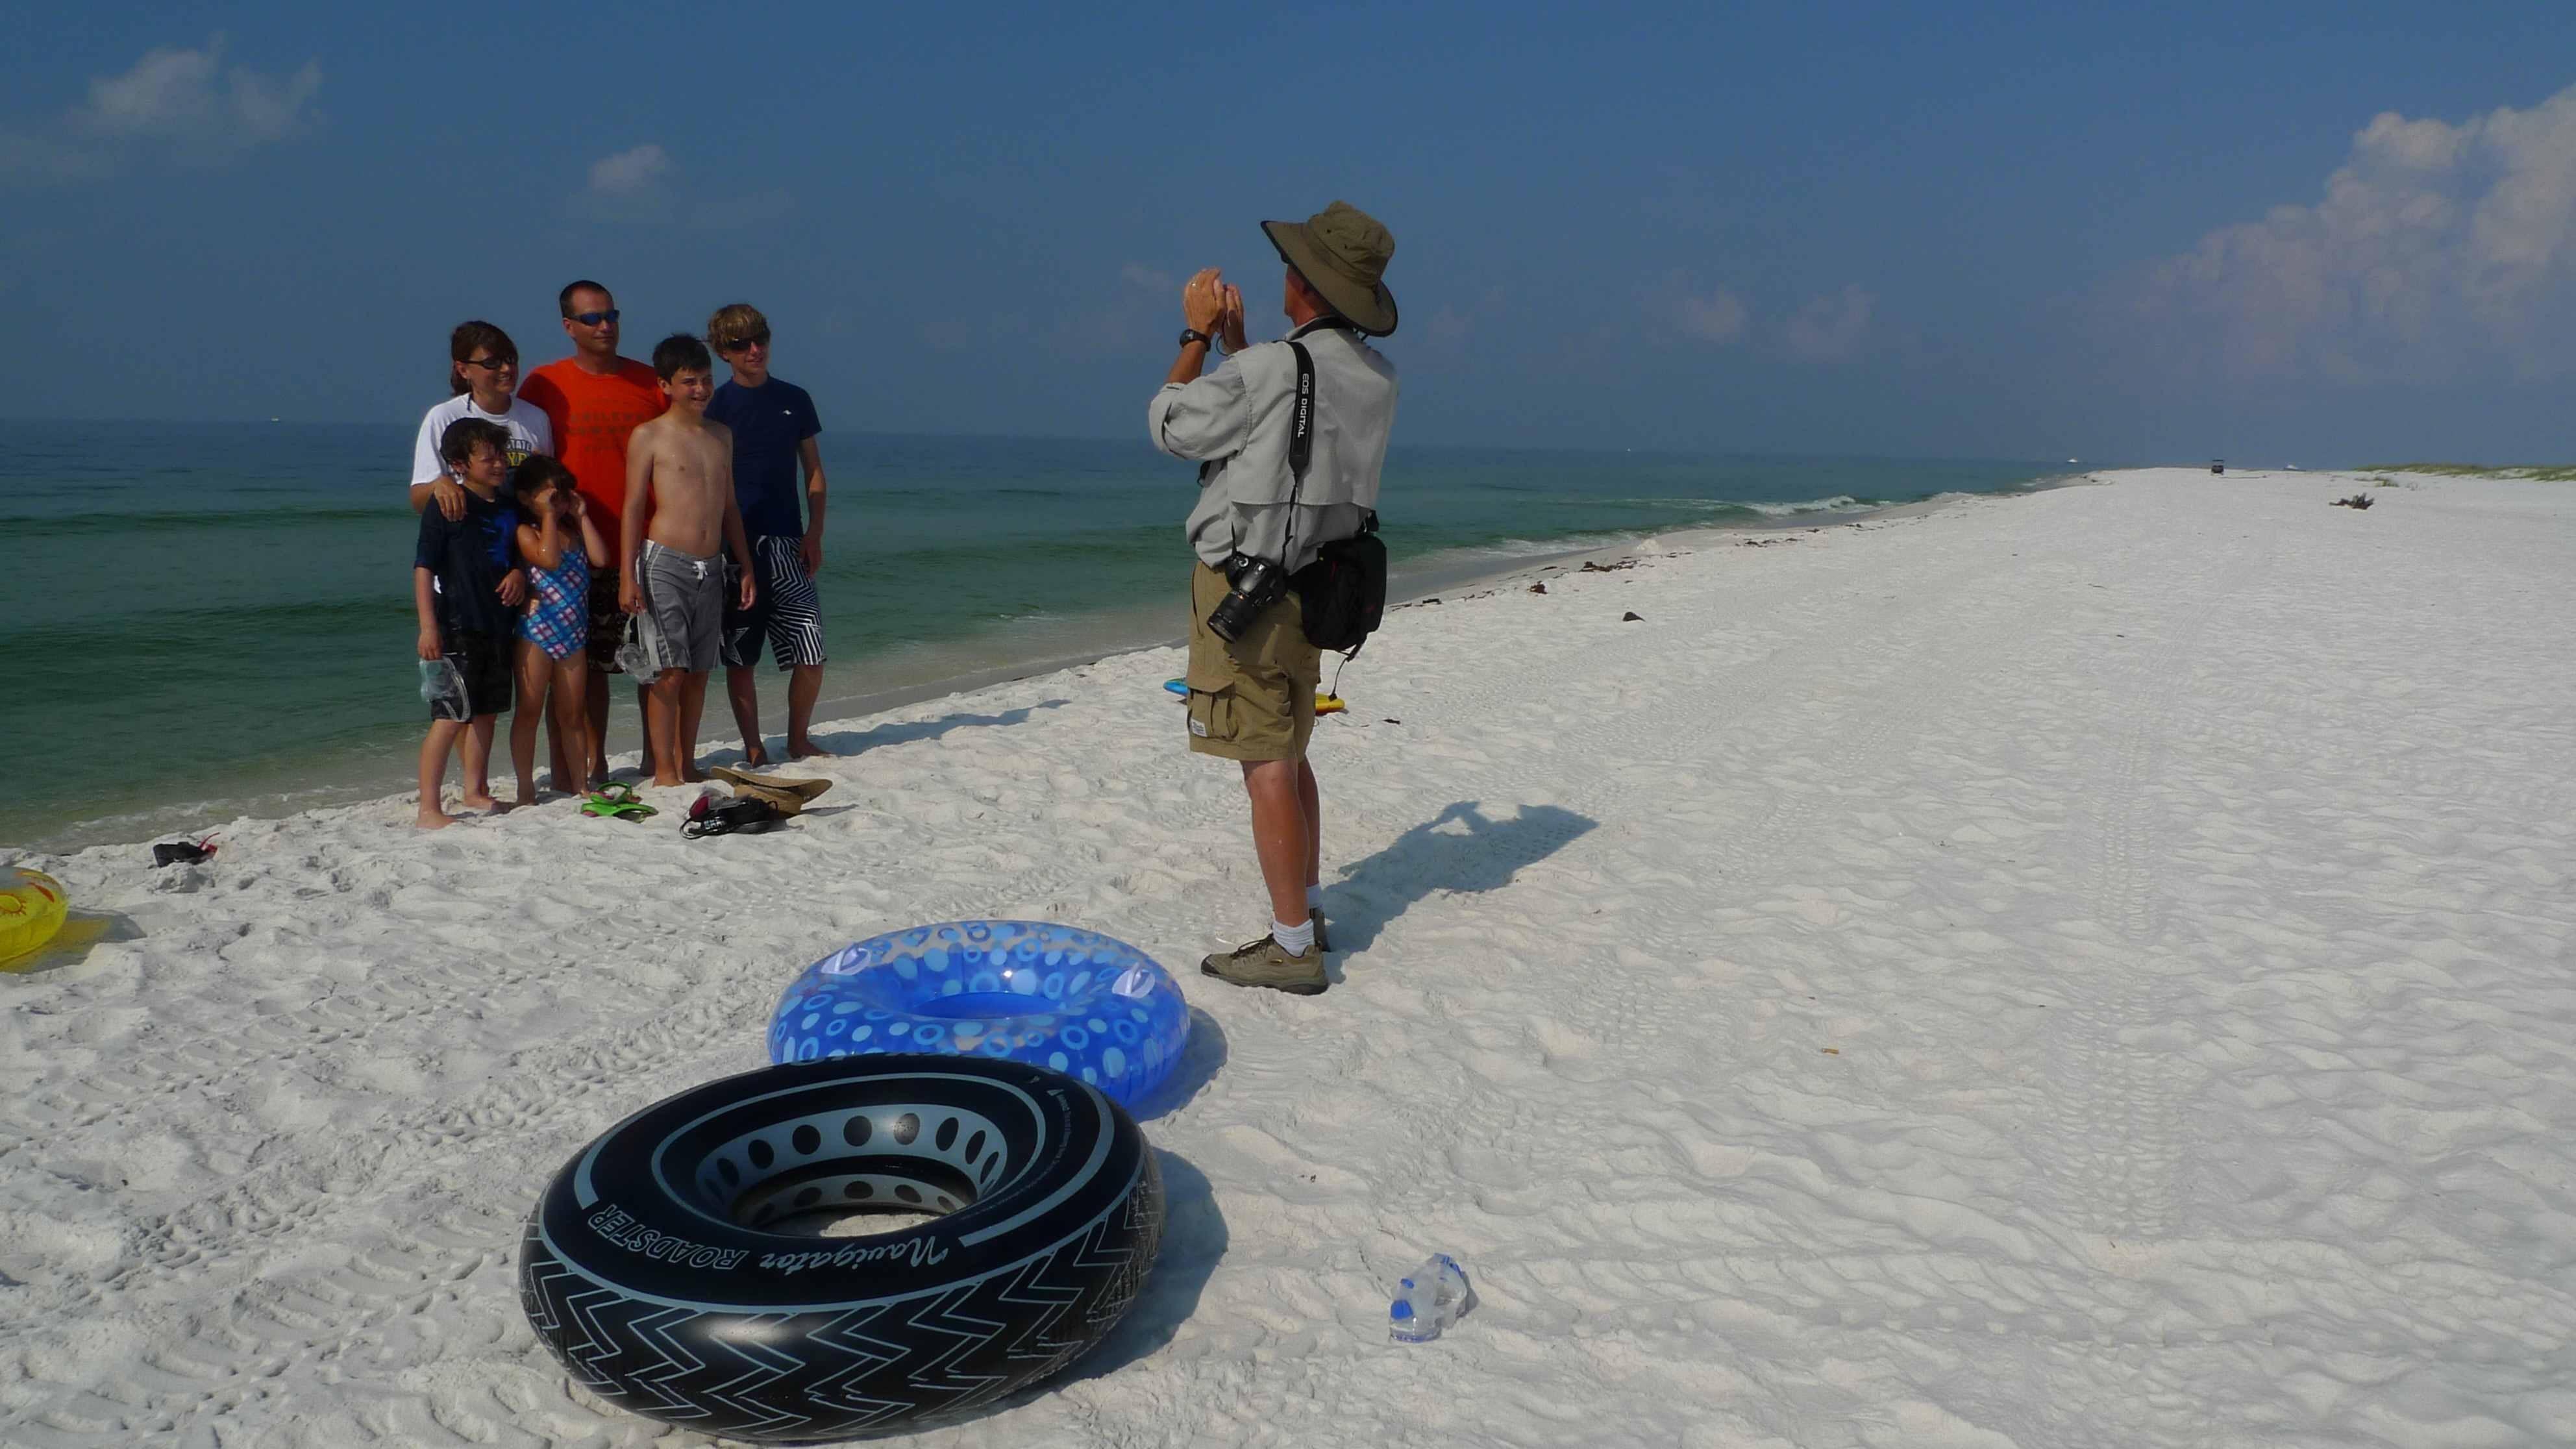 National Parks volunteer snaps a photo of a Kansan family at Gulf Shores National Seashore, near Pensacola, Florida.